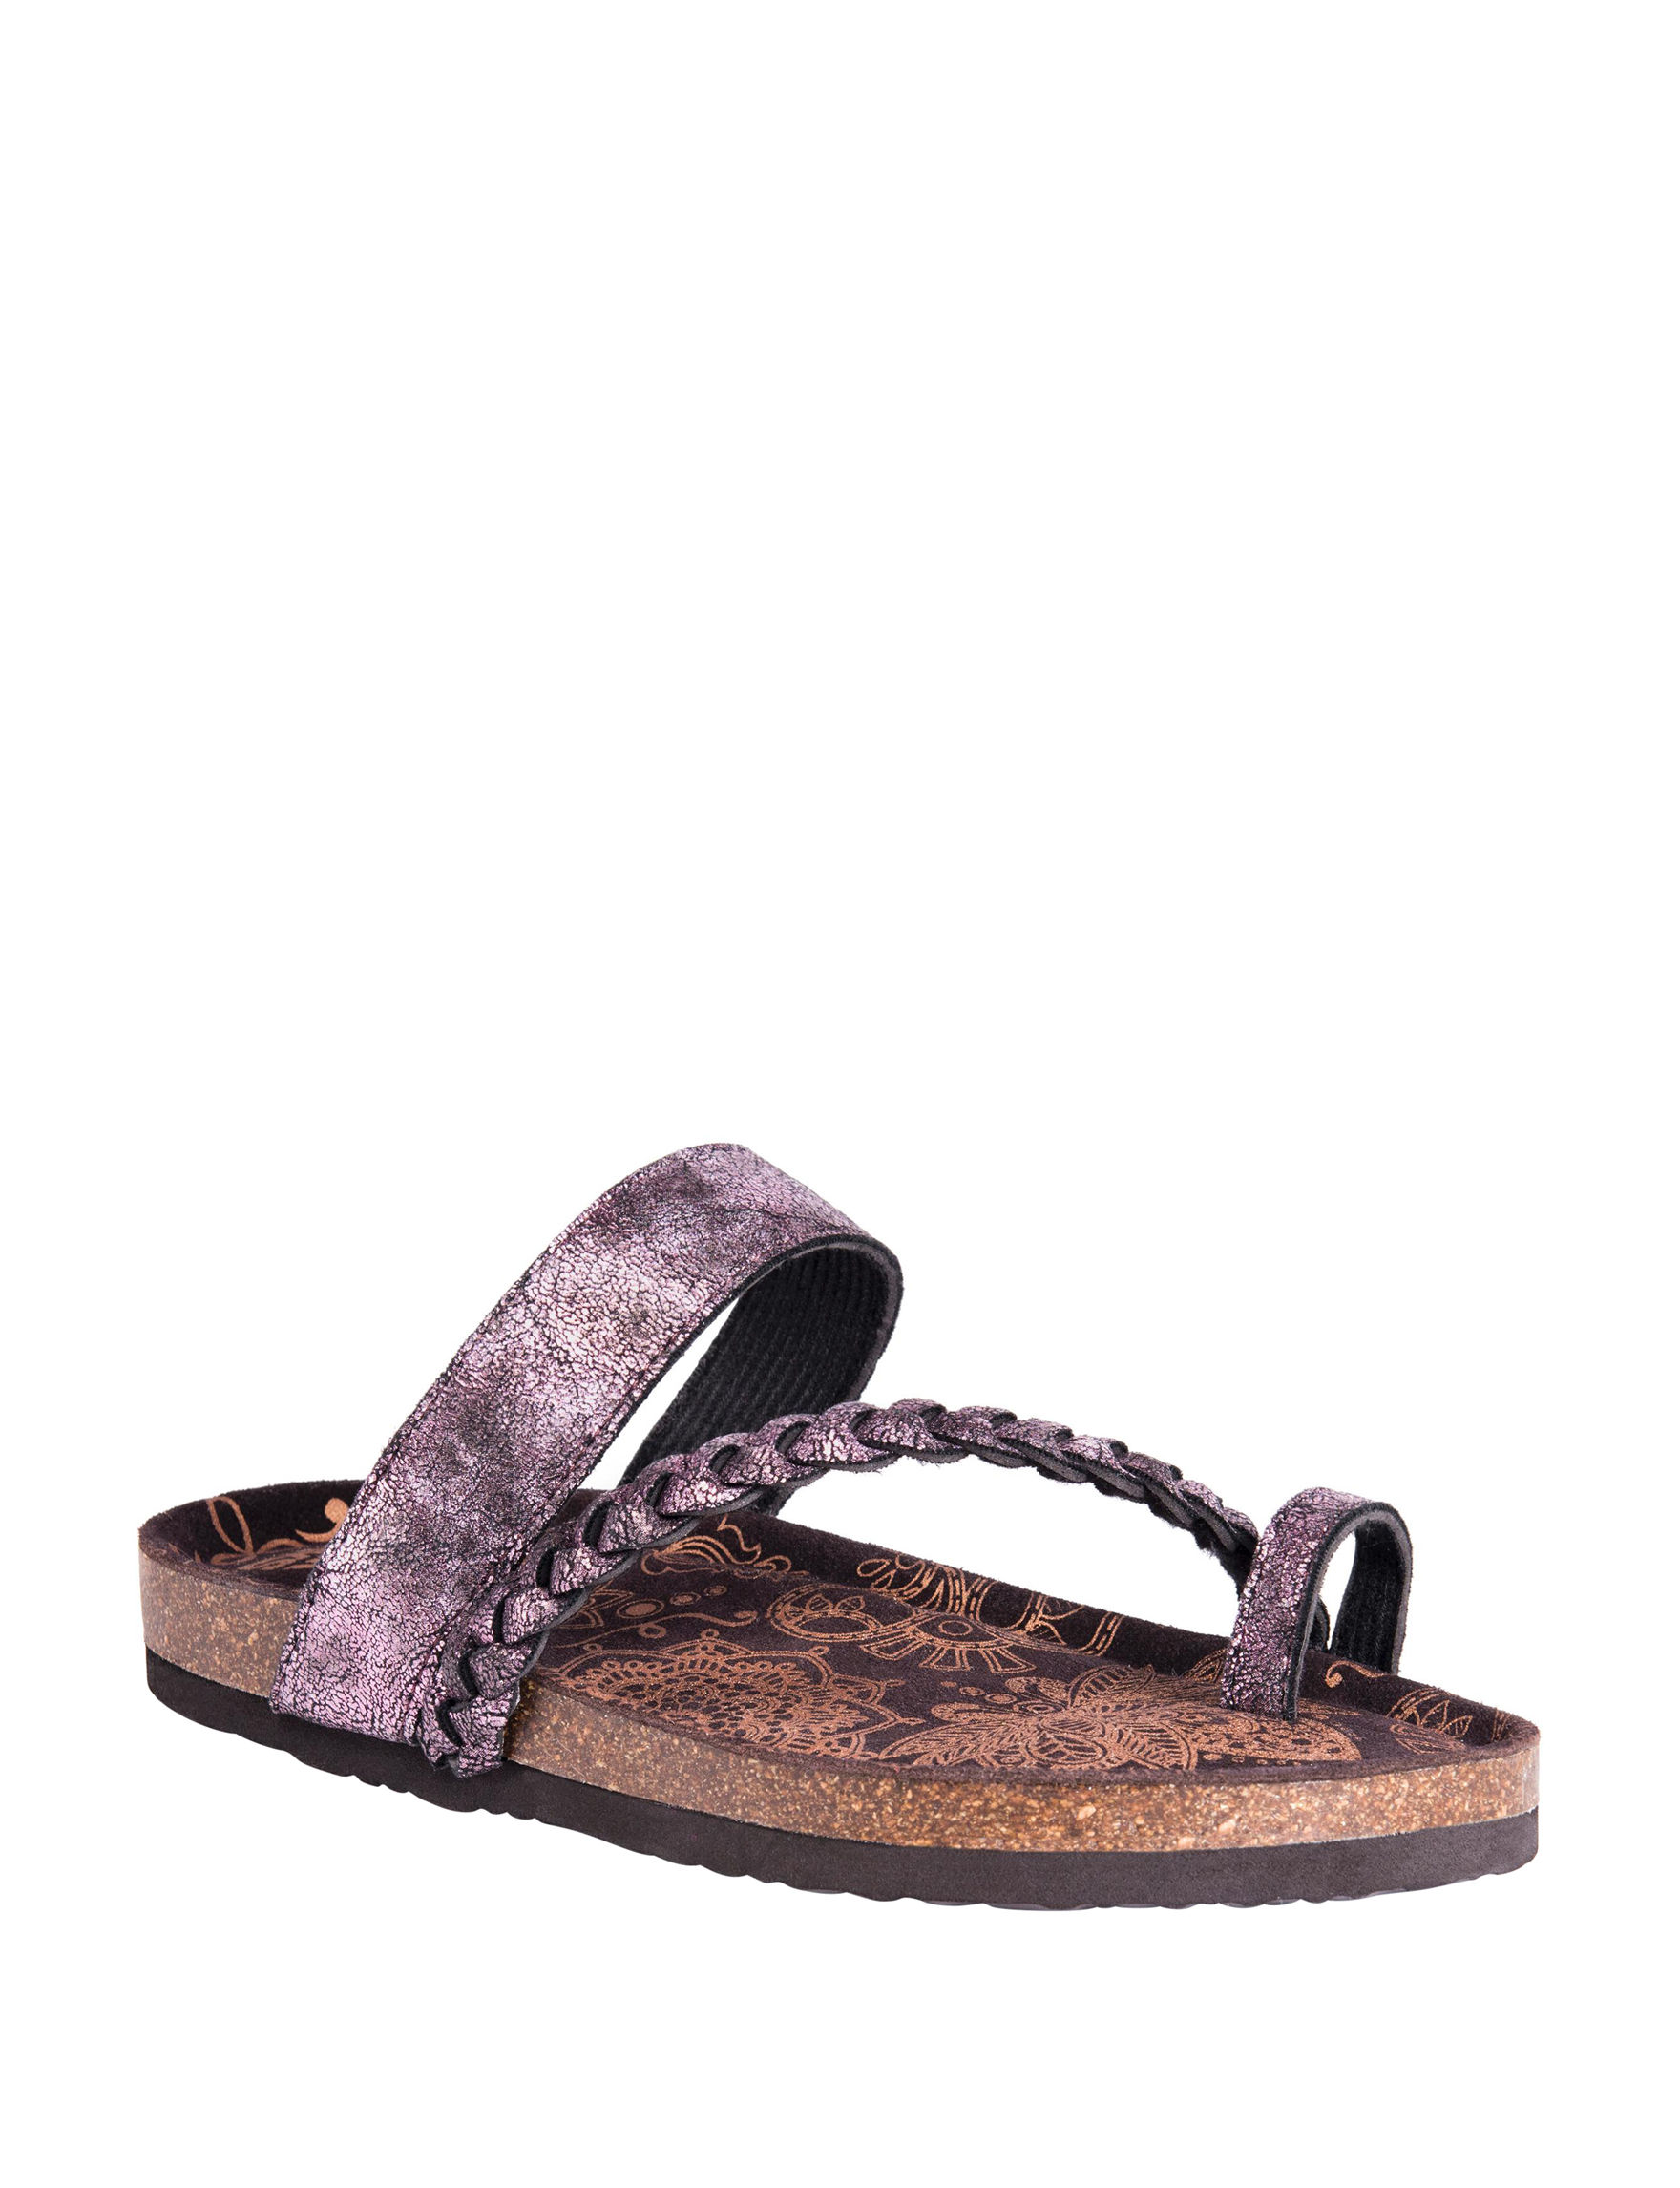 Muk Luks Purple Flat Sandals Slide Sandals